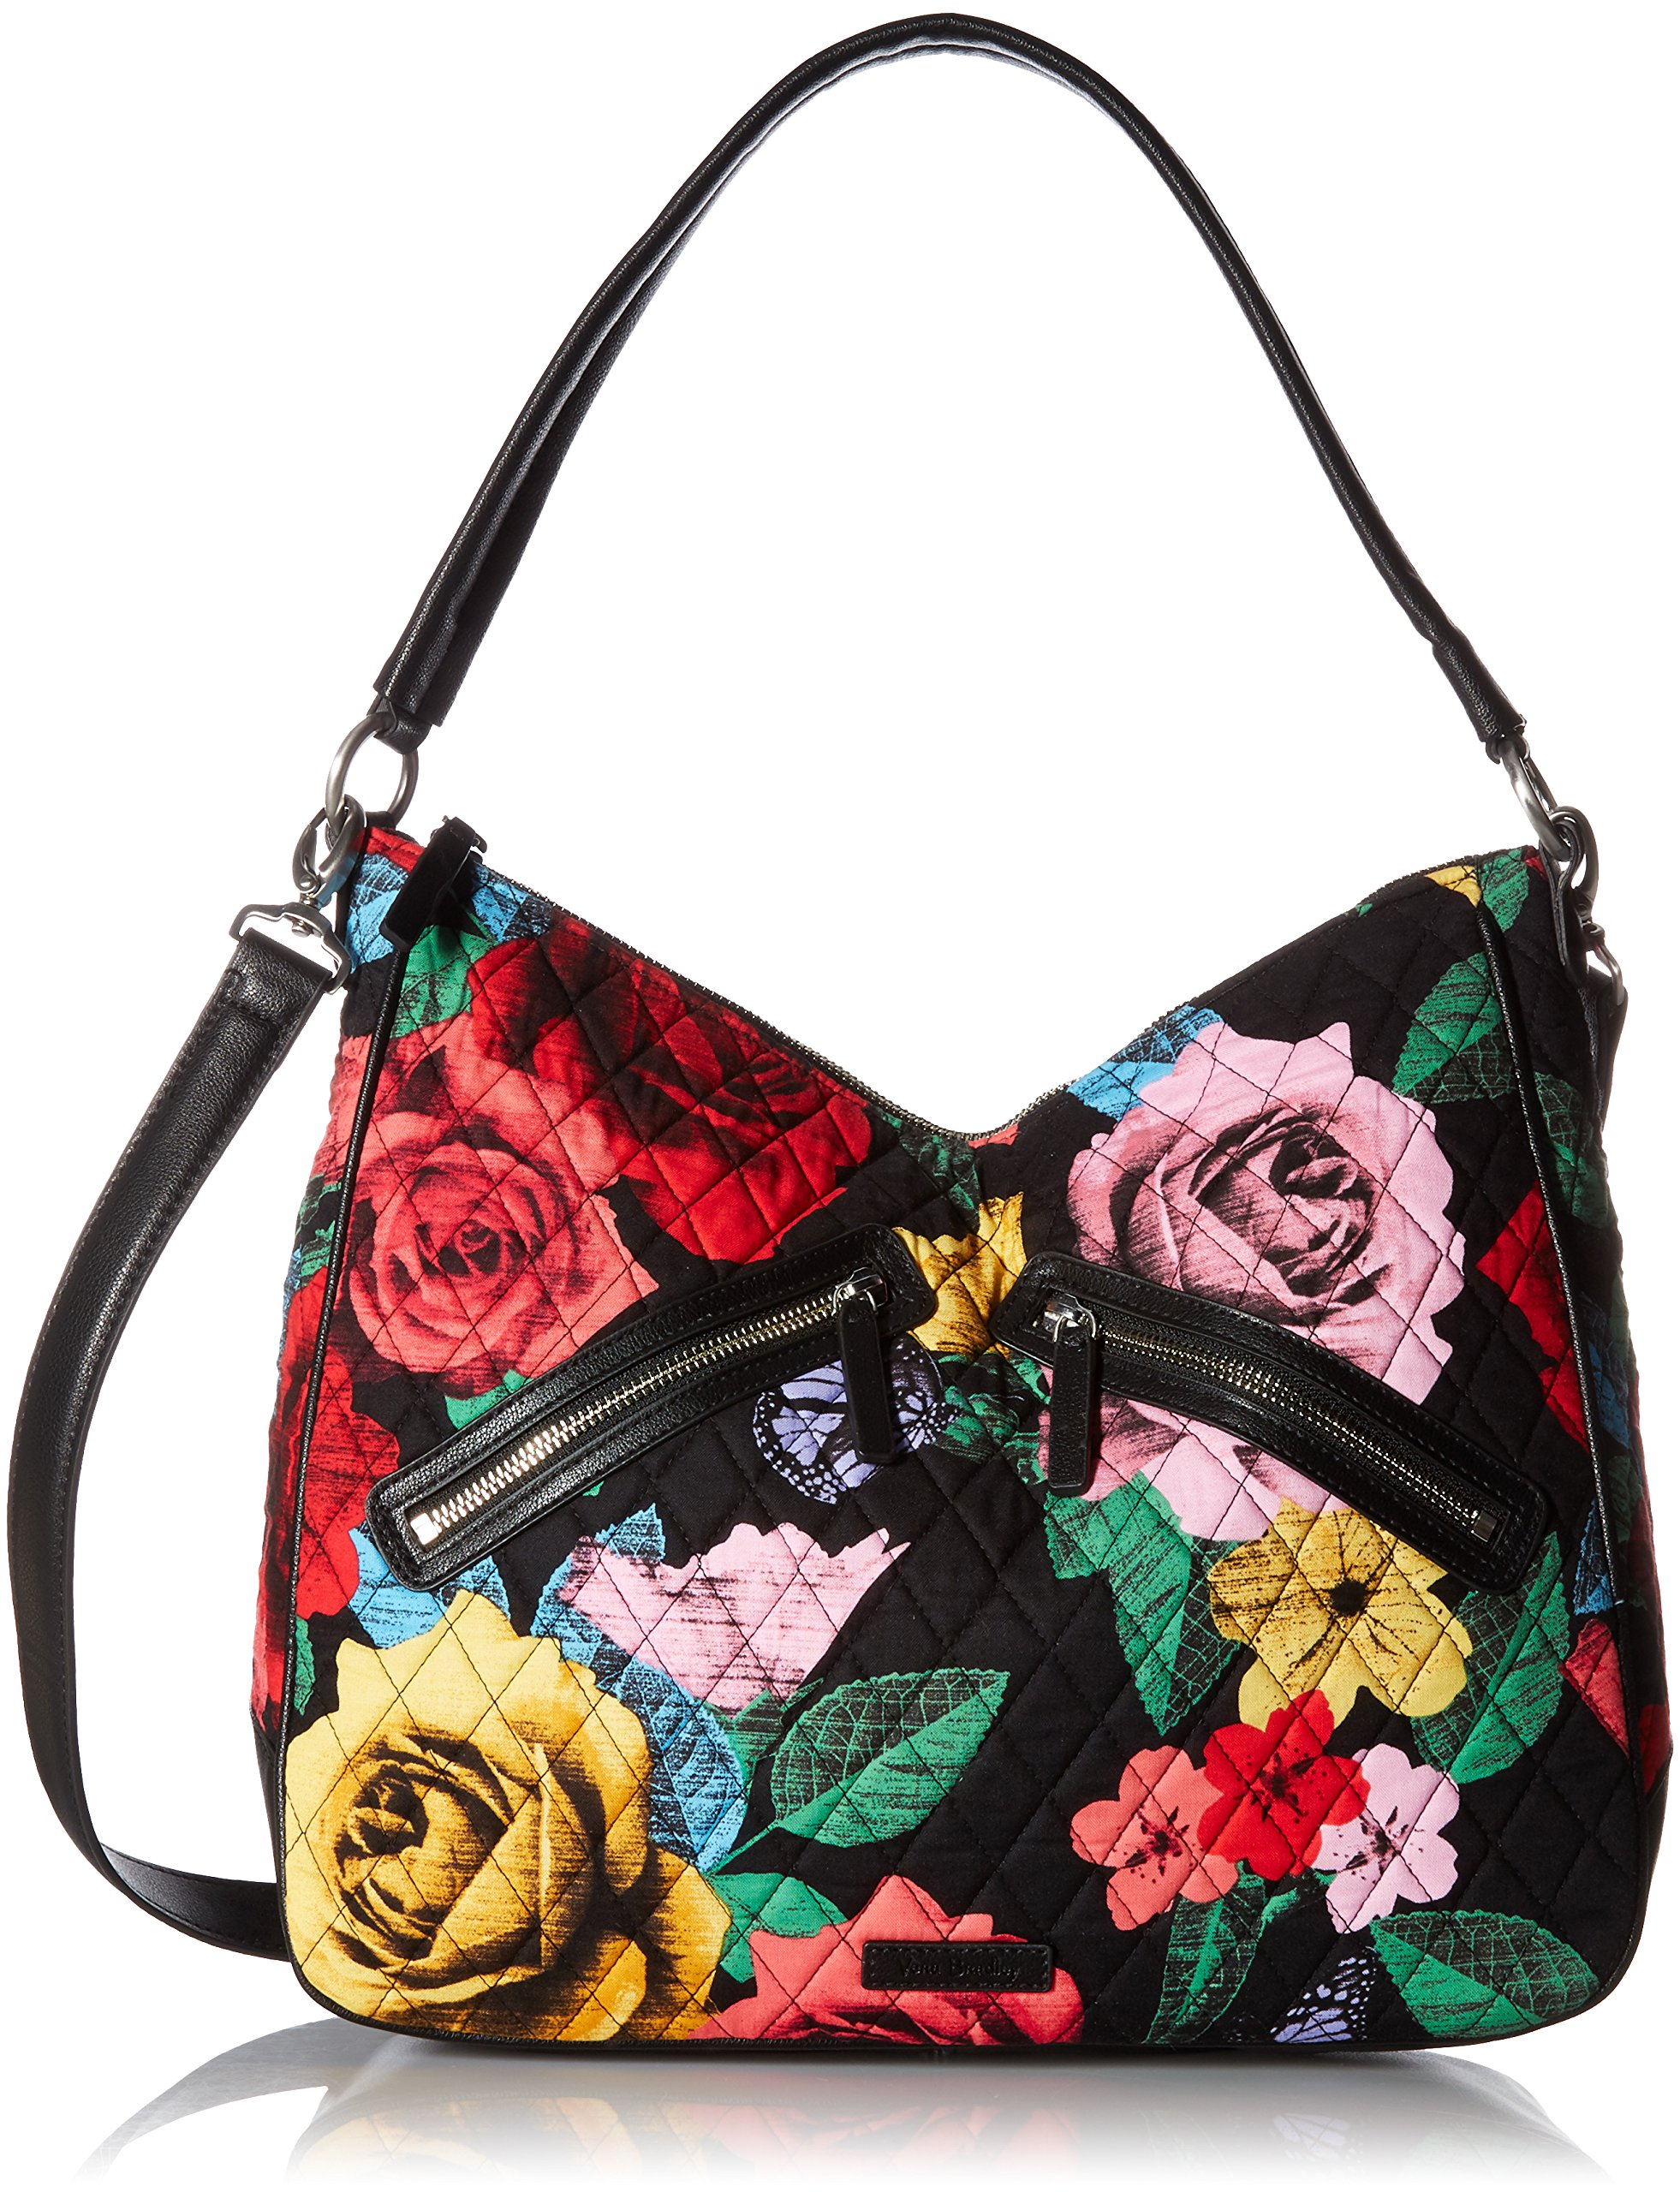 Vera Bradley Vivian Hobo Bag Cotton 1, Havana Rose